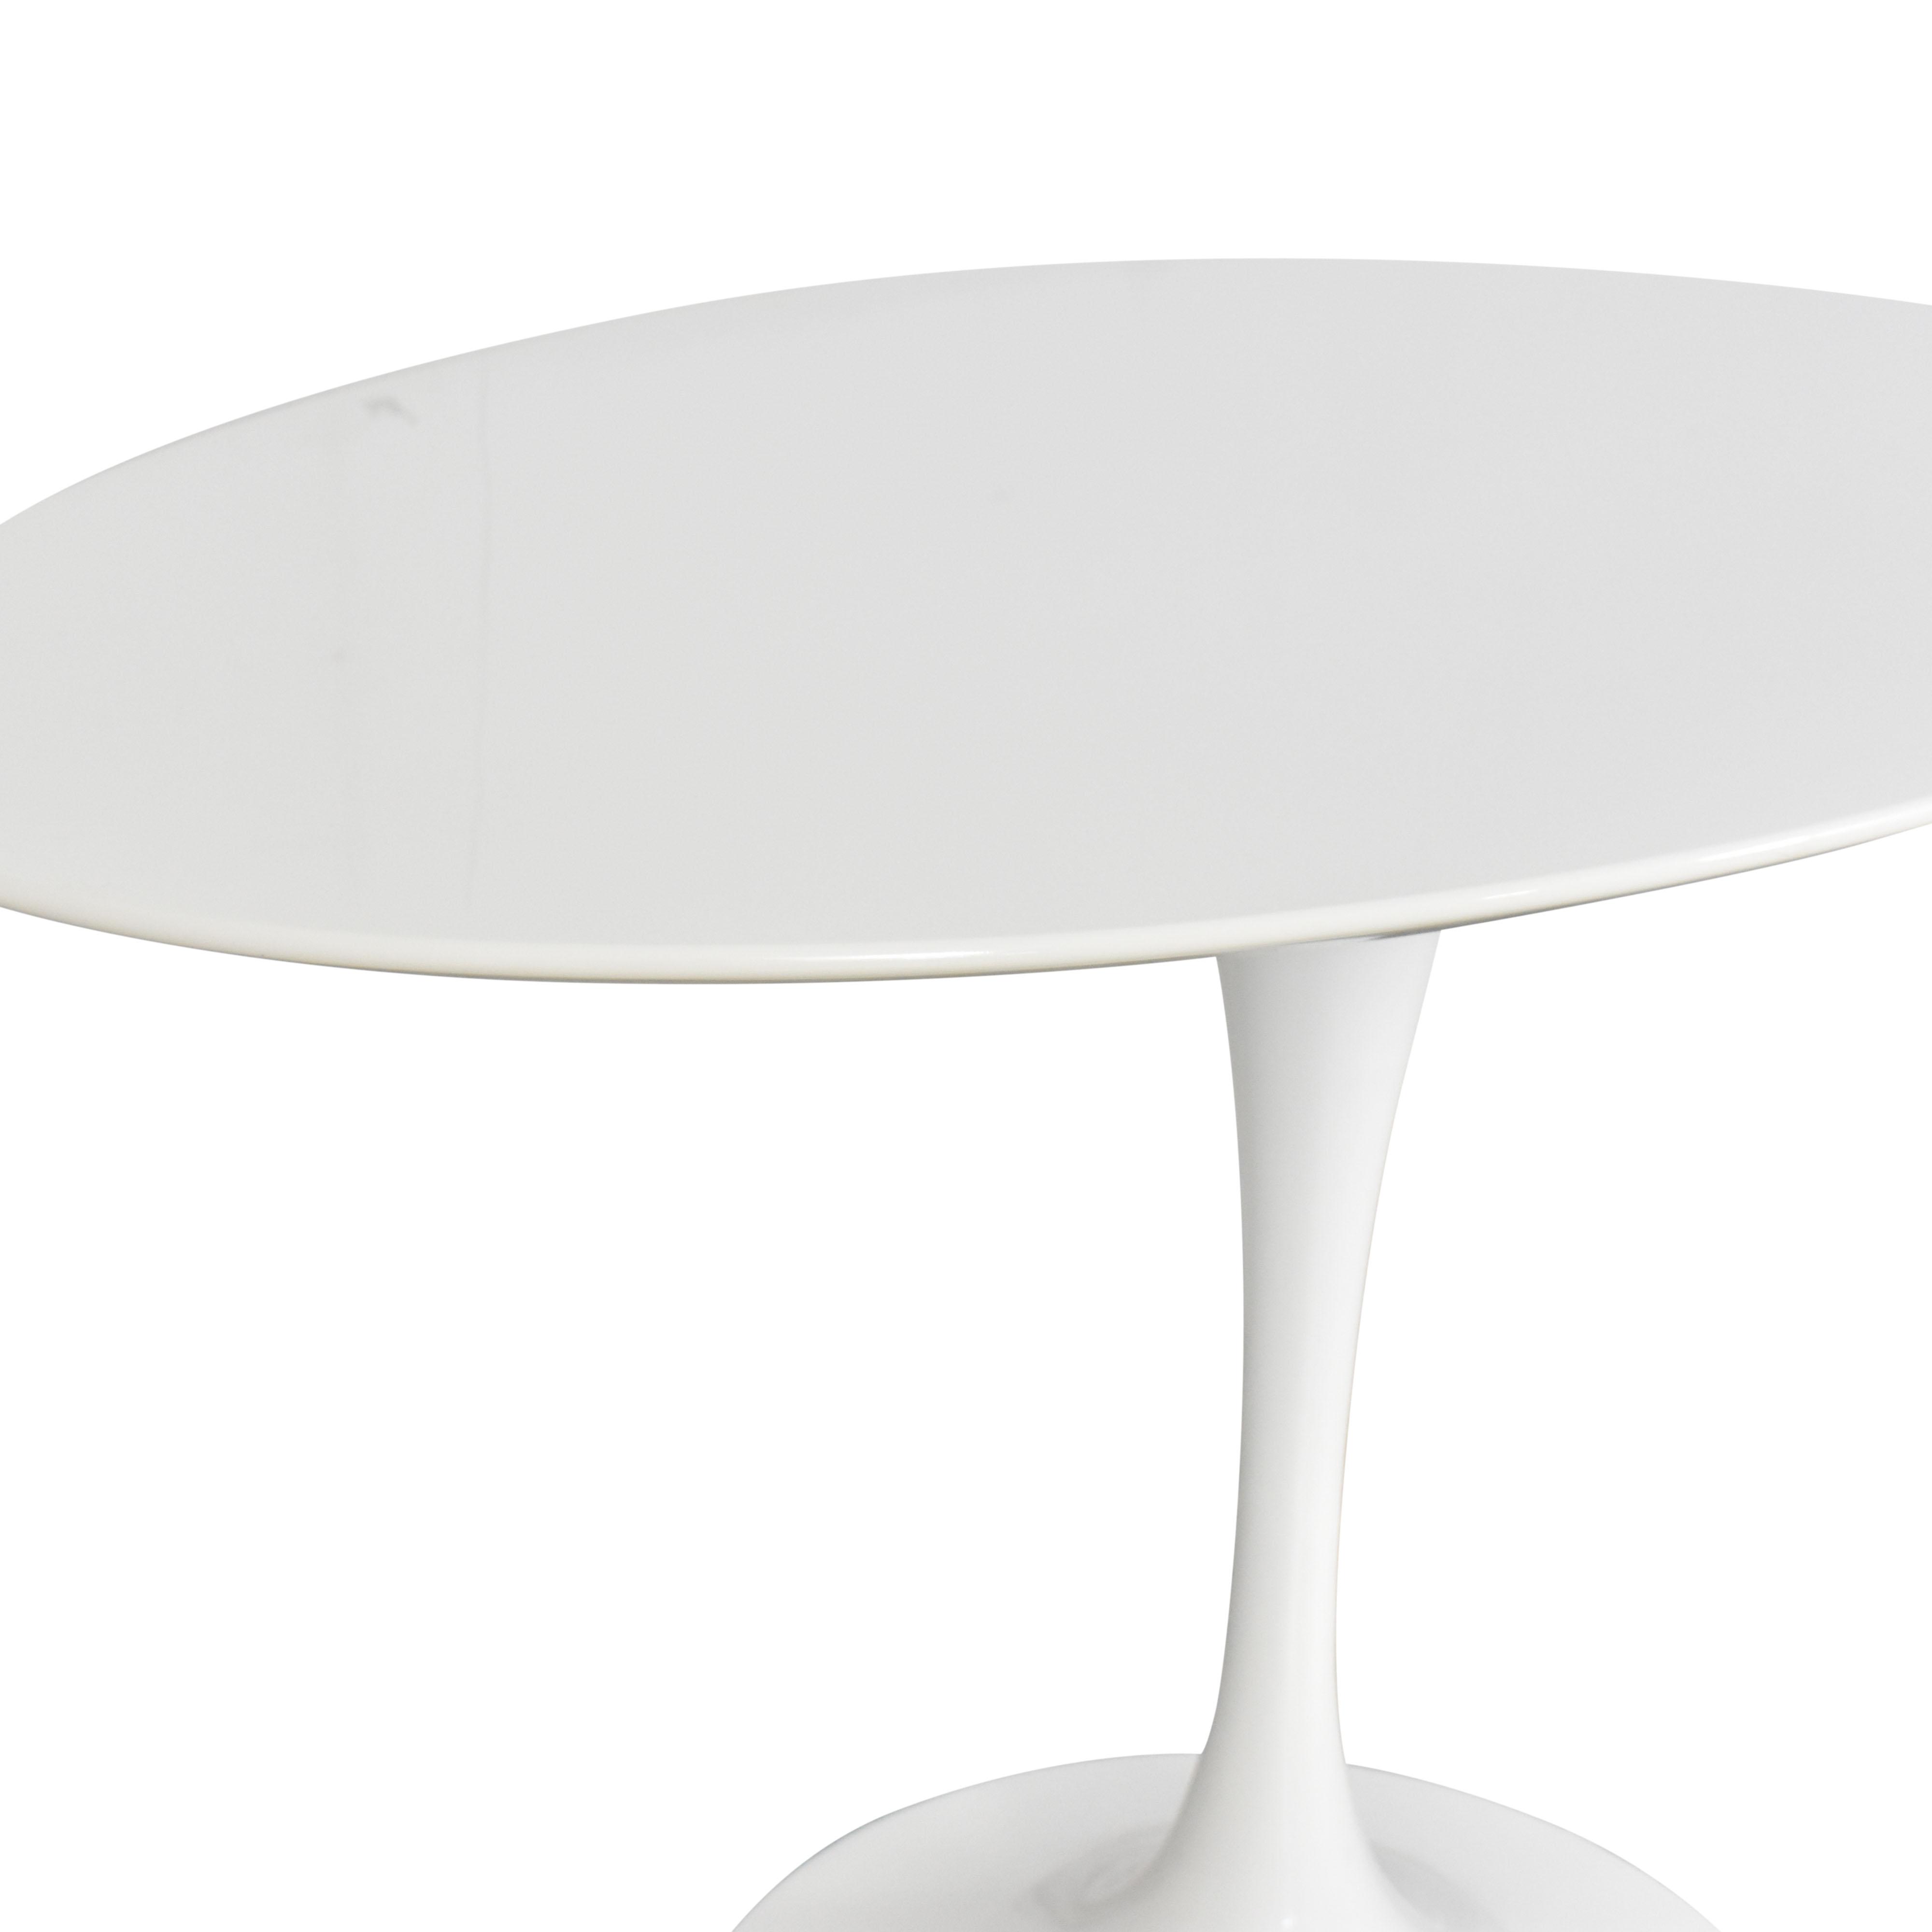 LexMod Lippa Oval Dining Table / Tables